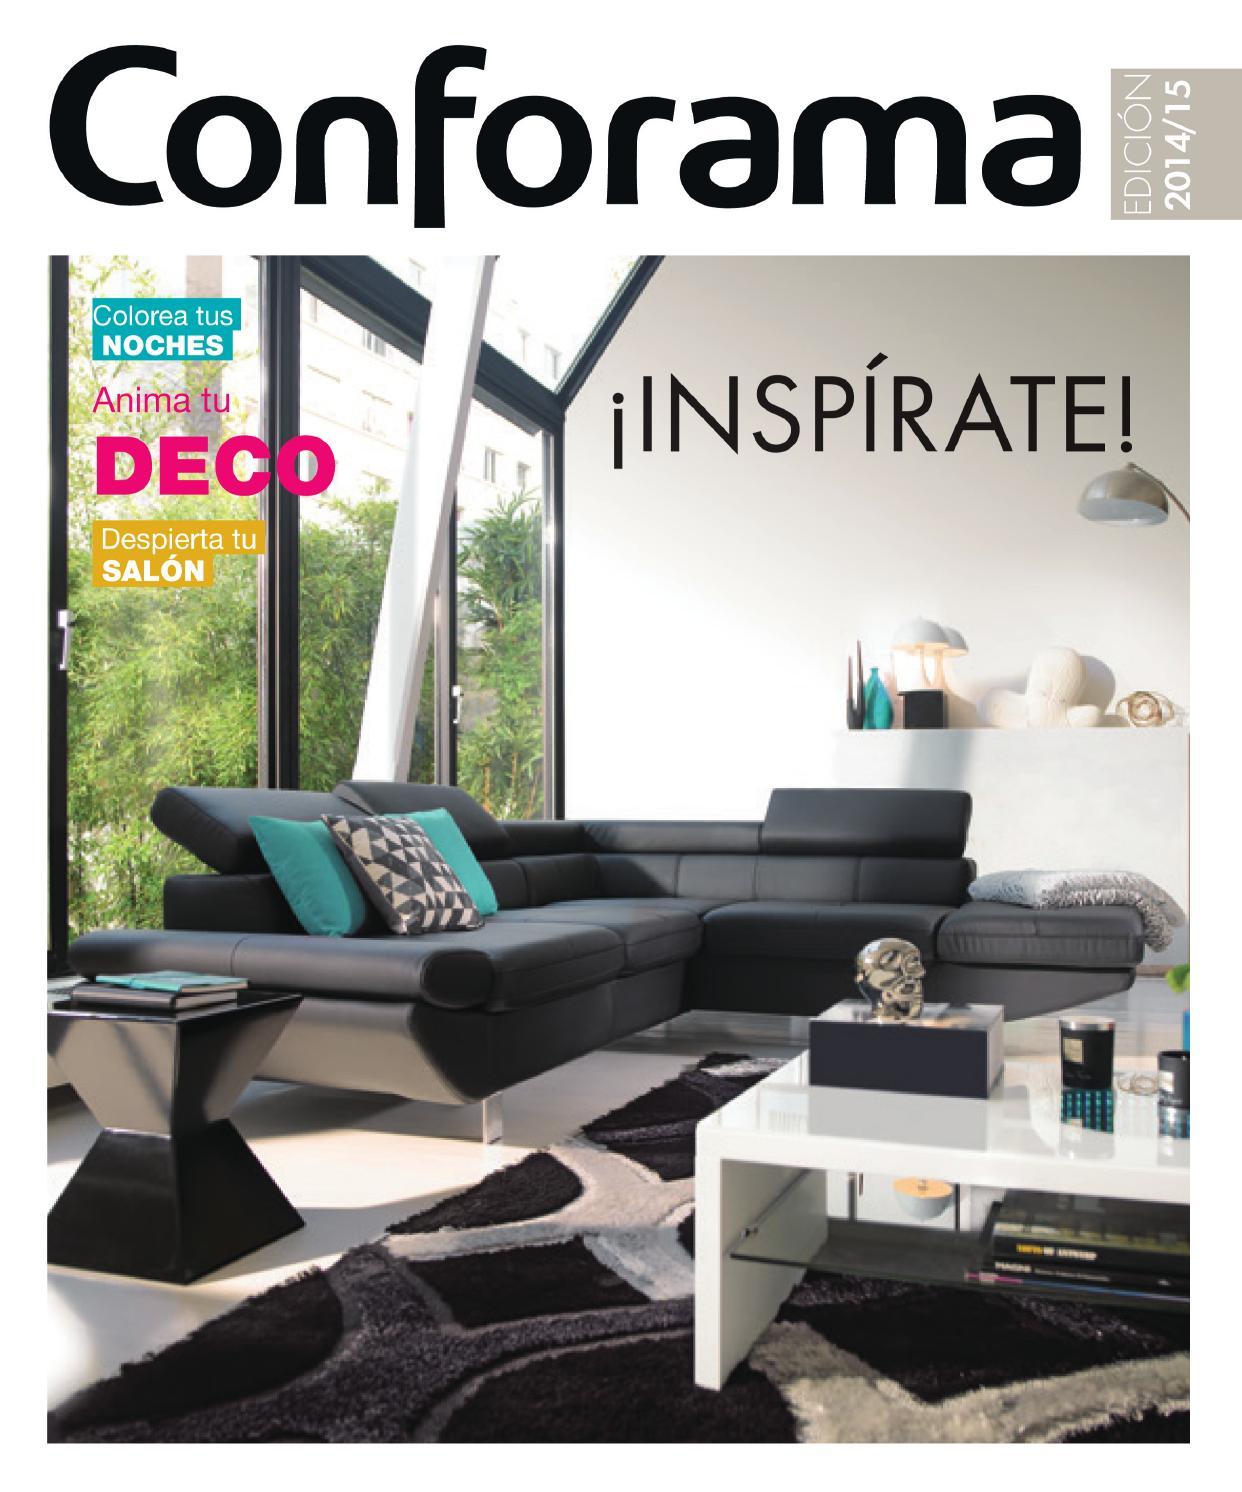 Conforama catalogo anual 2014 15 by losdescuentos issuu for Conforama espejos salon